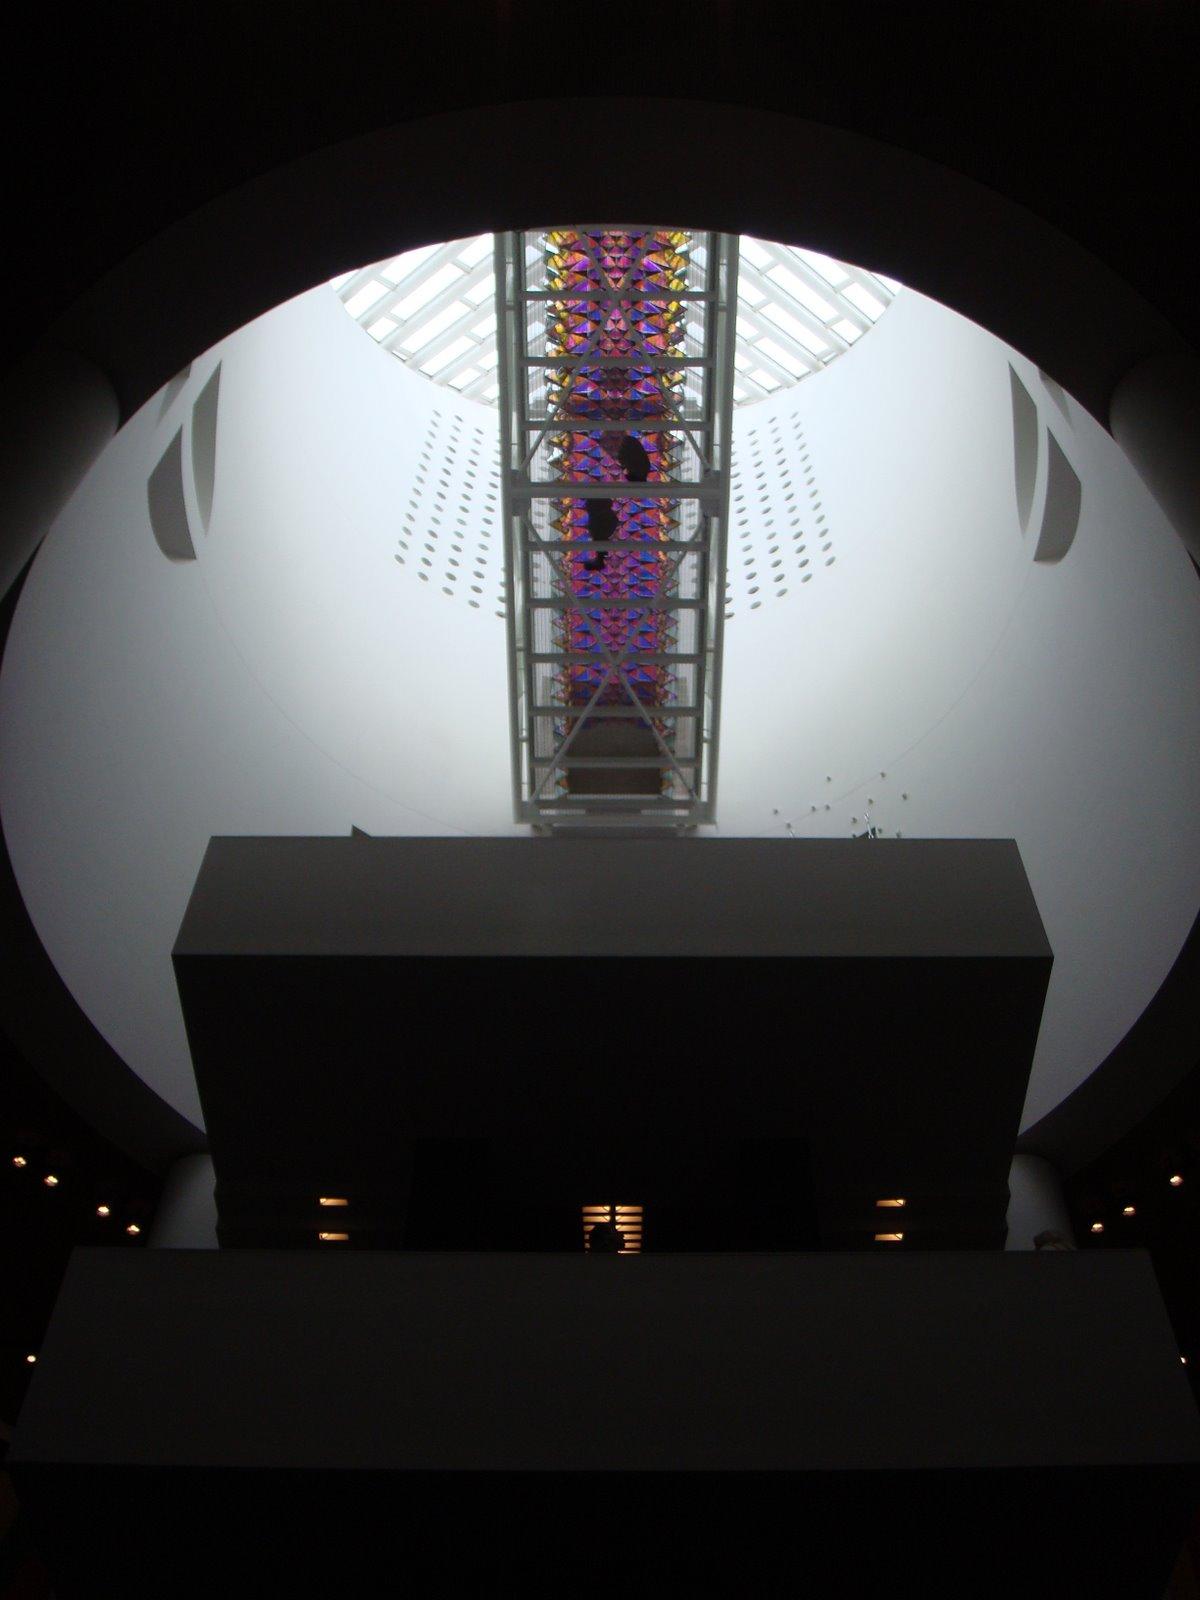 San francisco museum of modern art sfmoma pictures for San francisco museum modern art